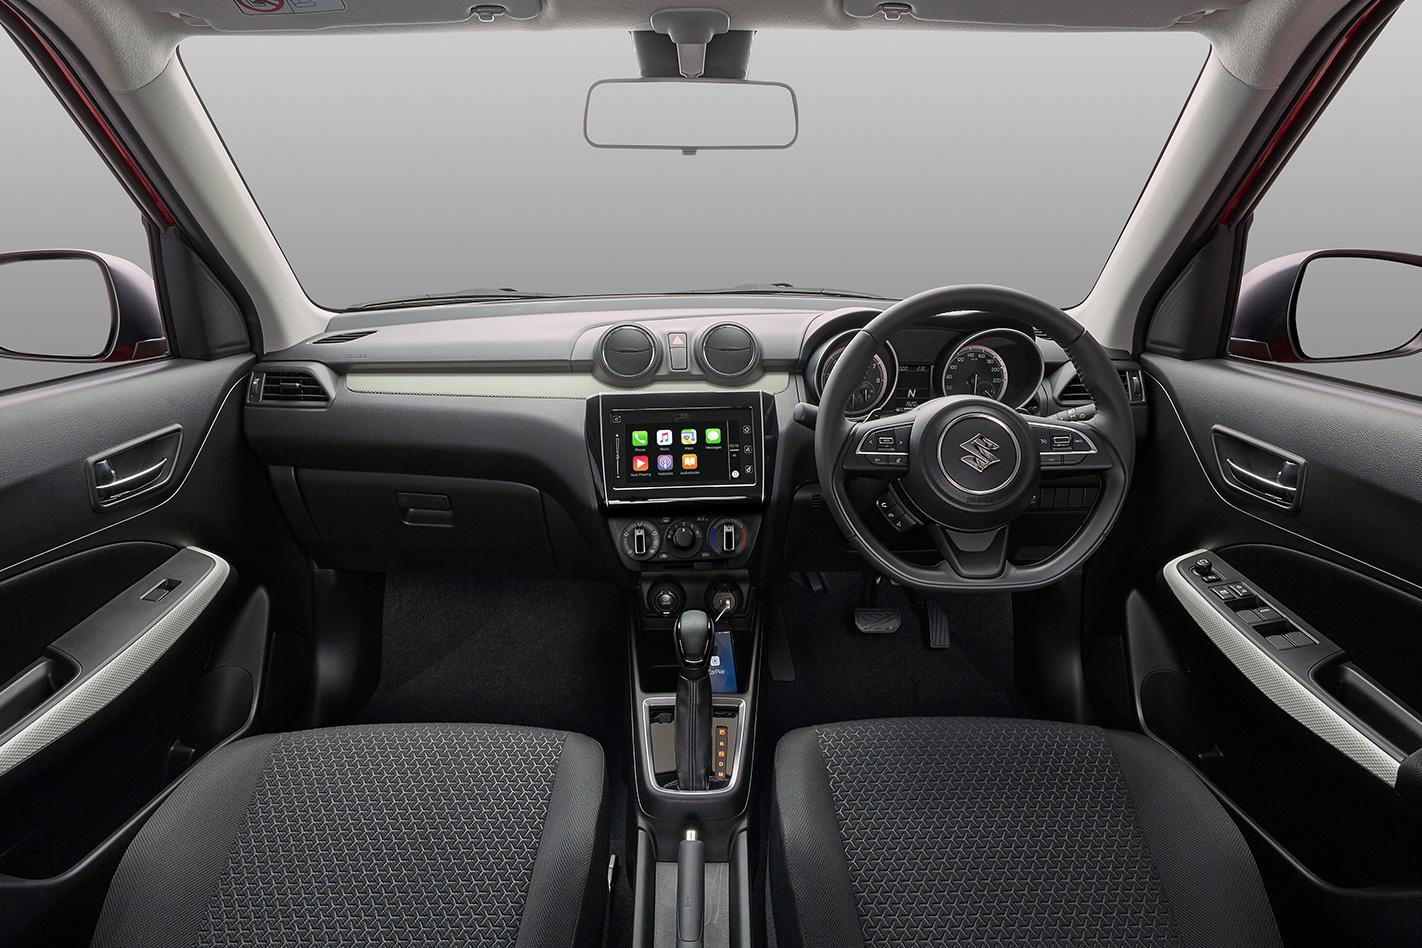 2019 Suzuki Swift GL Navigator manual announced